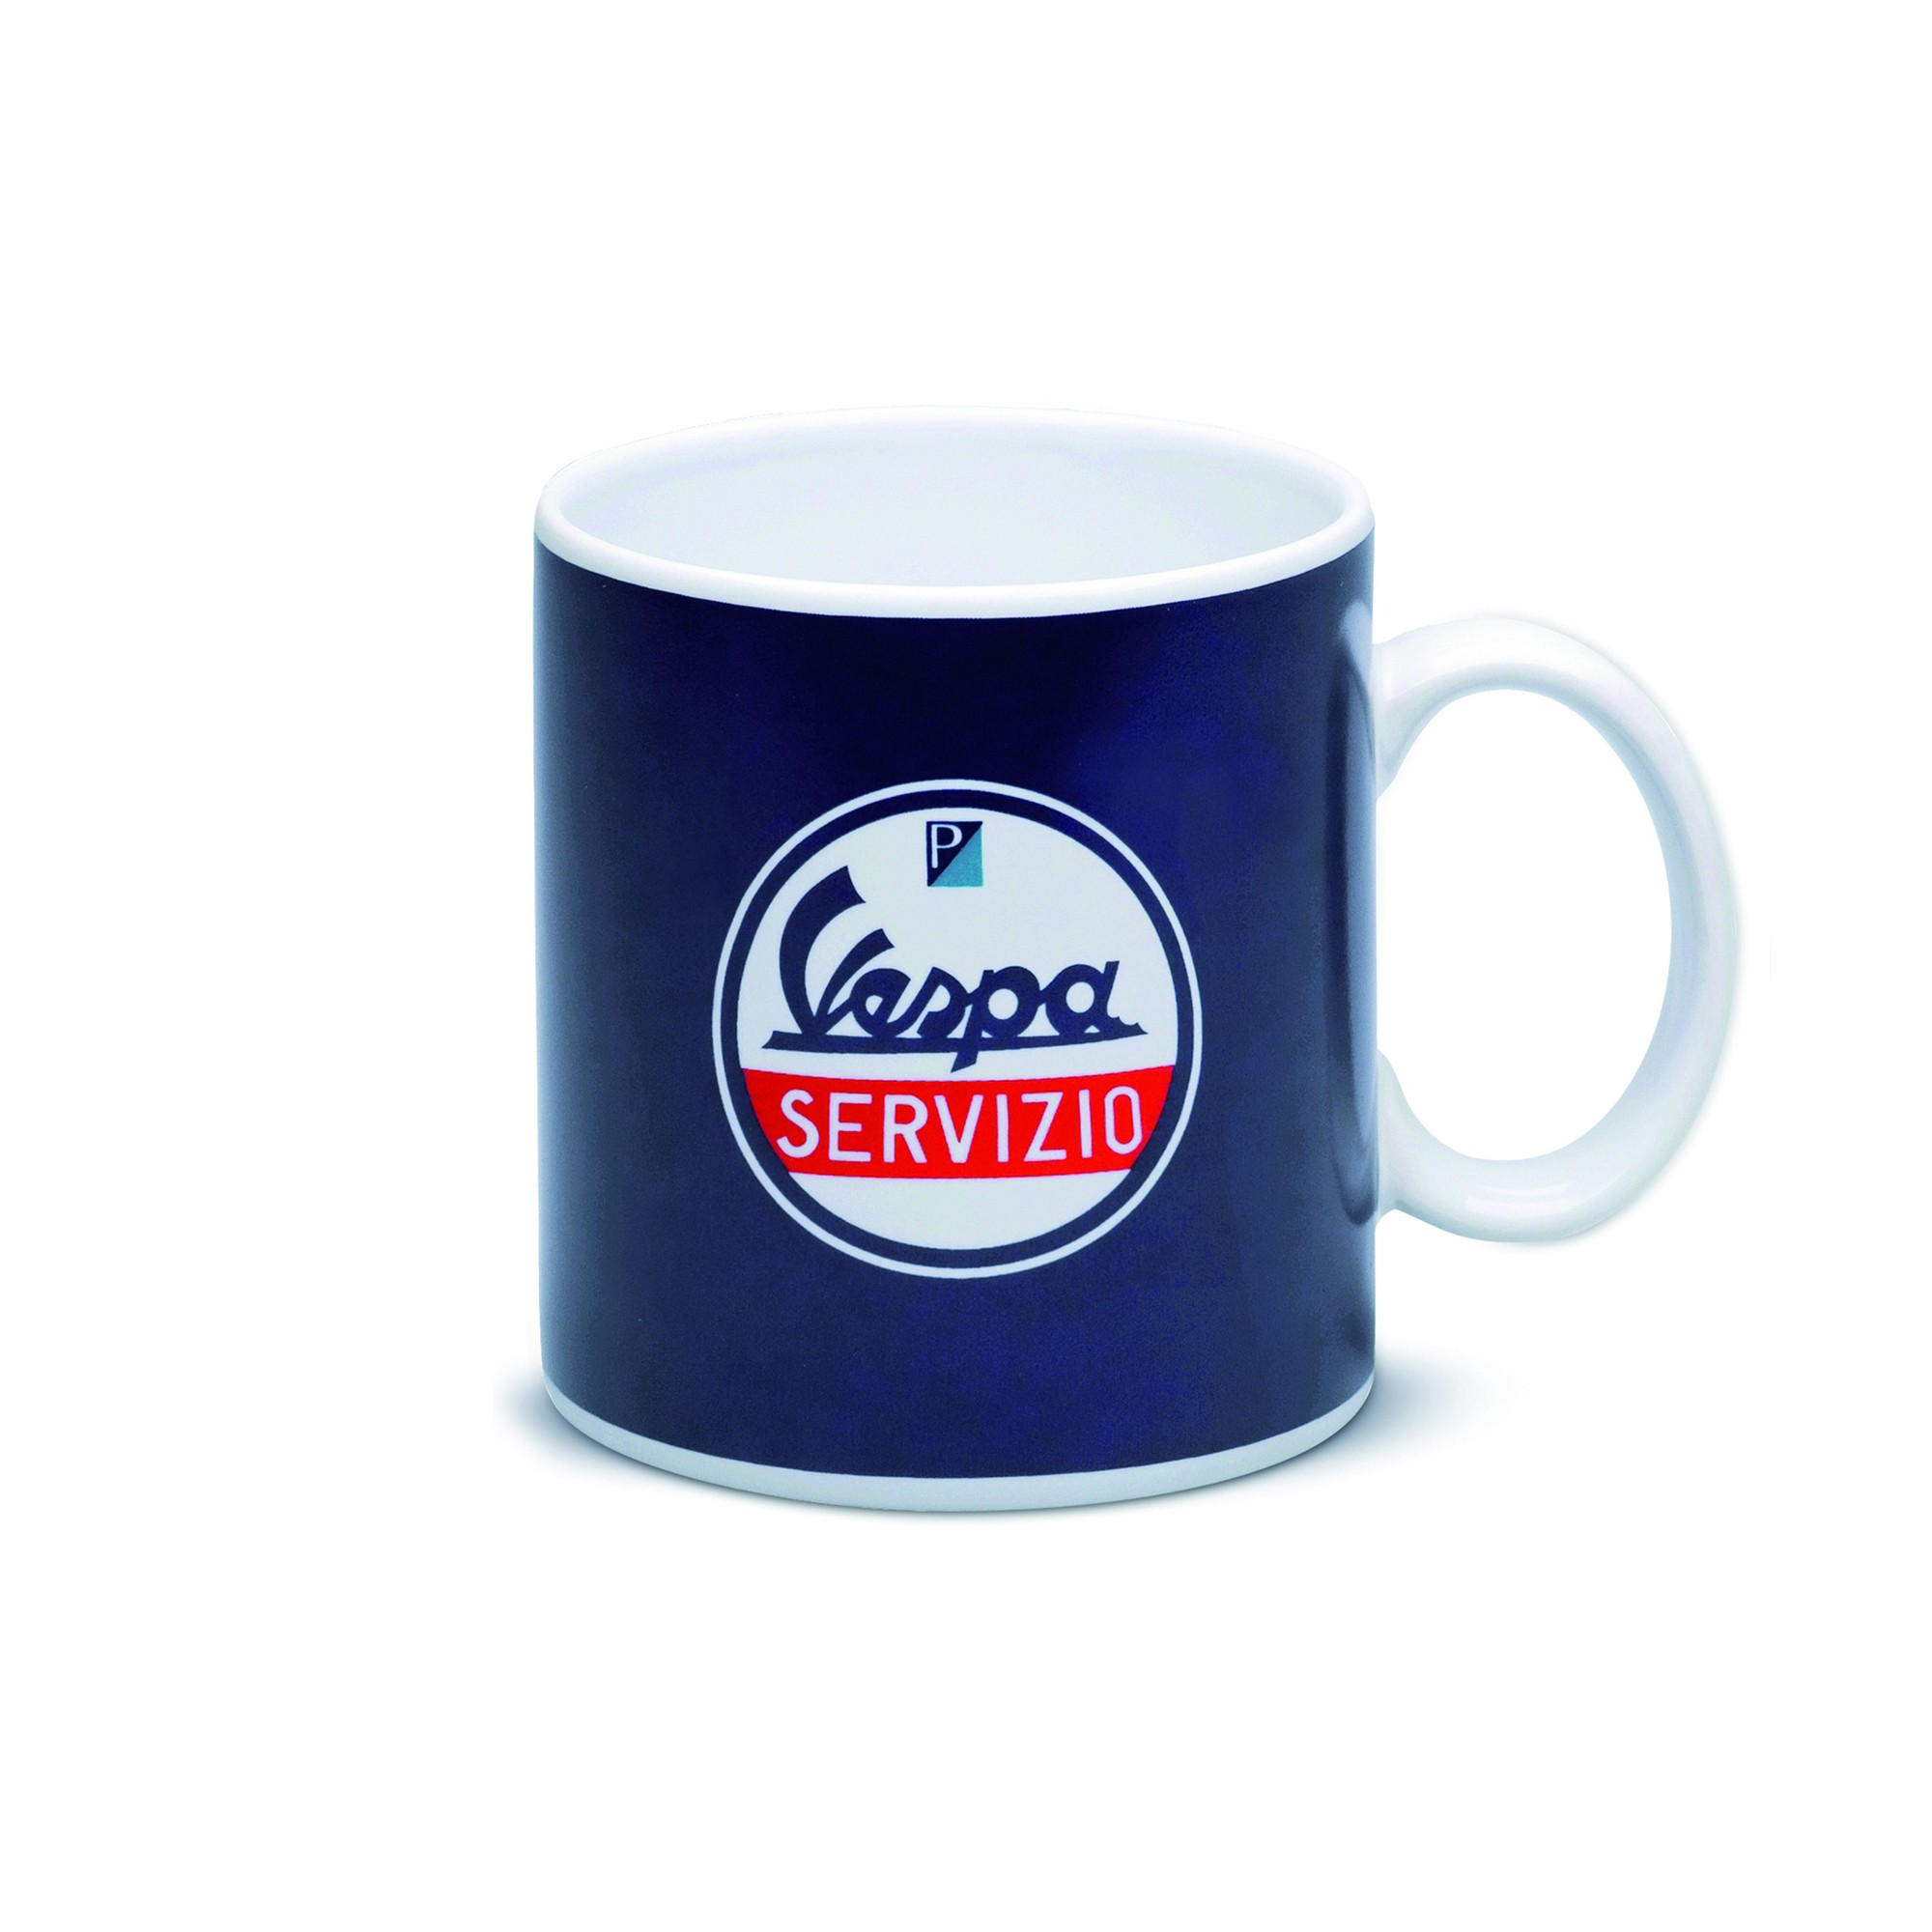 Vespa Servizio Coffee Mug Blue